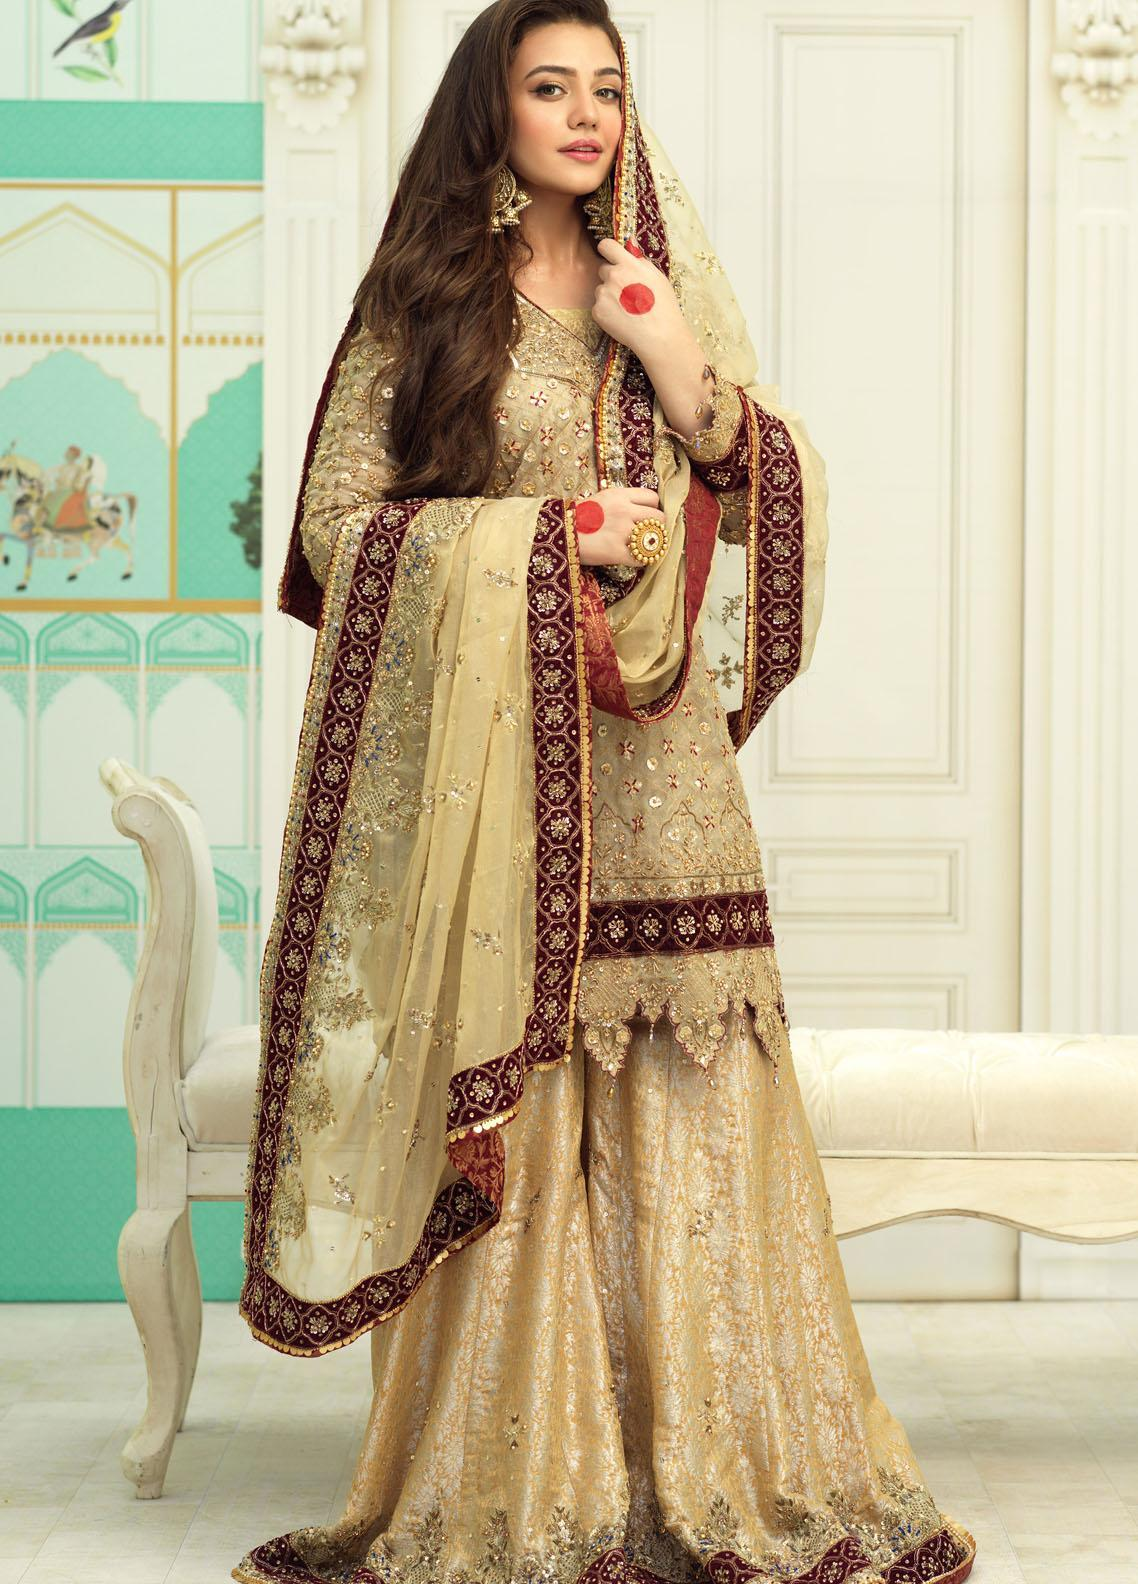 Zaaviay Luxury Pret Embroidered Net 3 Piece Dress GULNAAZ